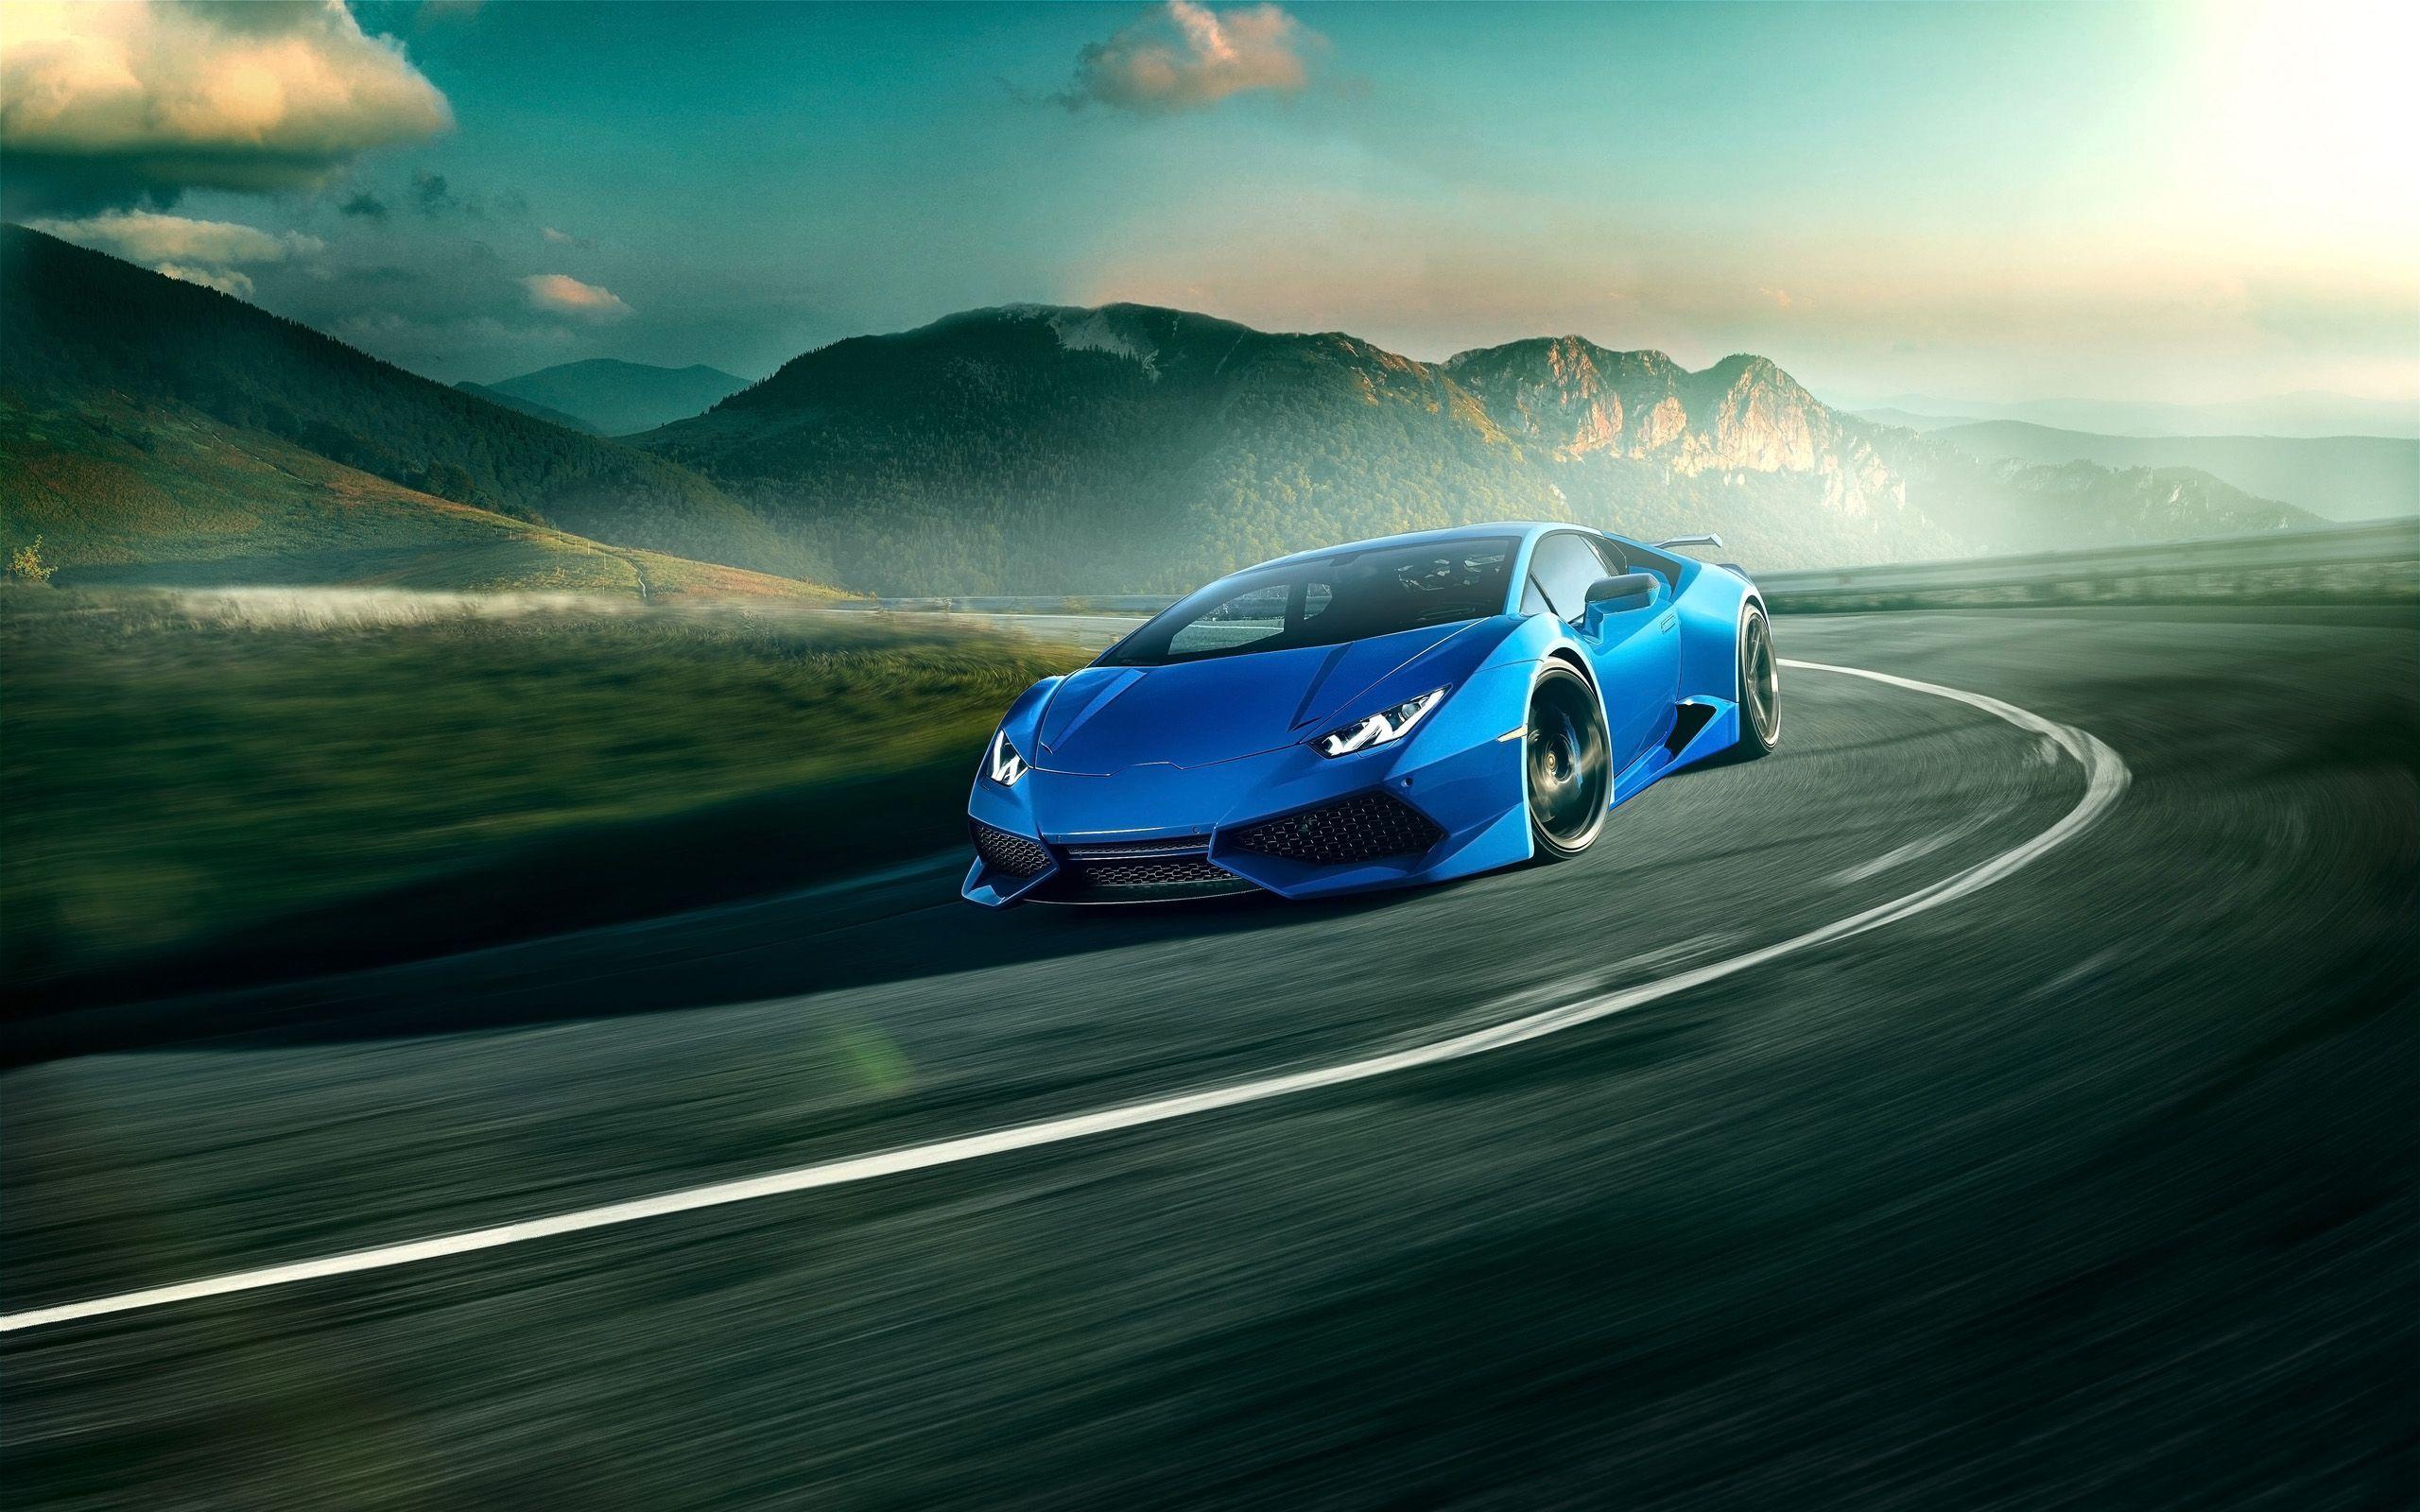 2048x1536 Car Wallpapers Lamborghini Wallpaper 12 2560x1600